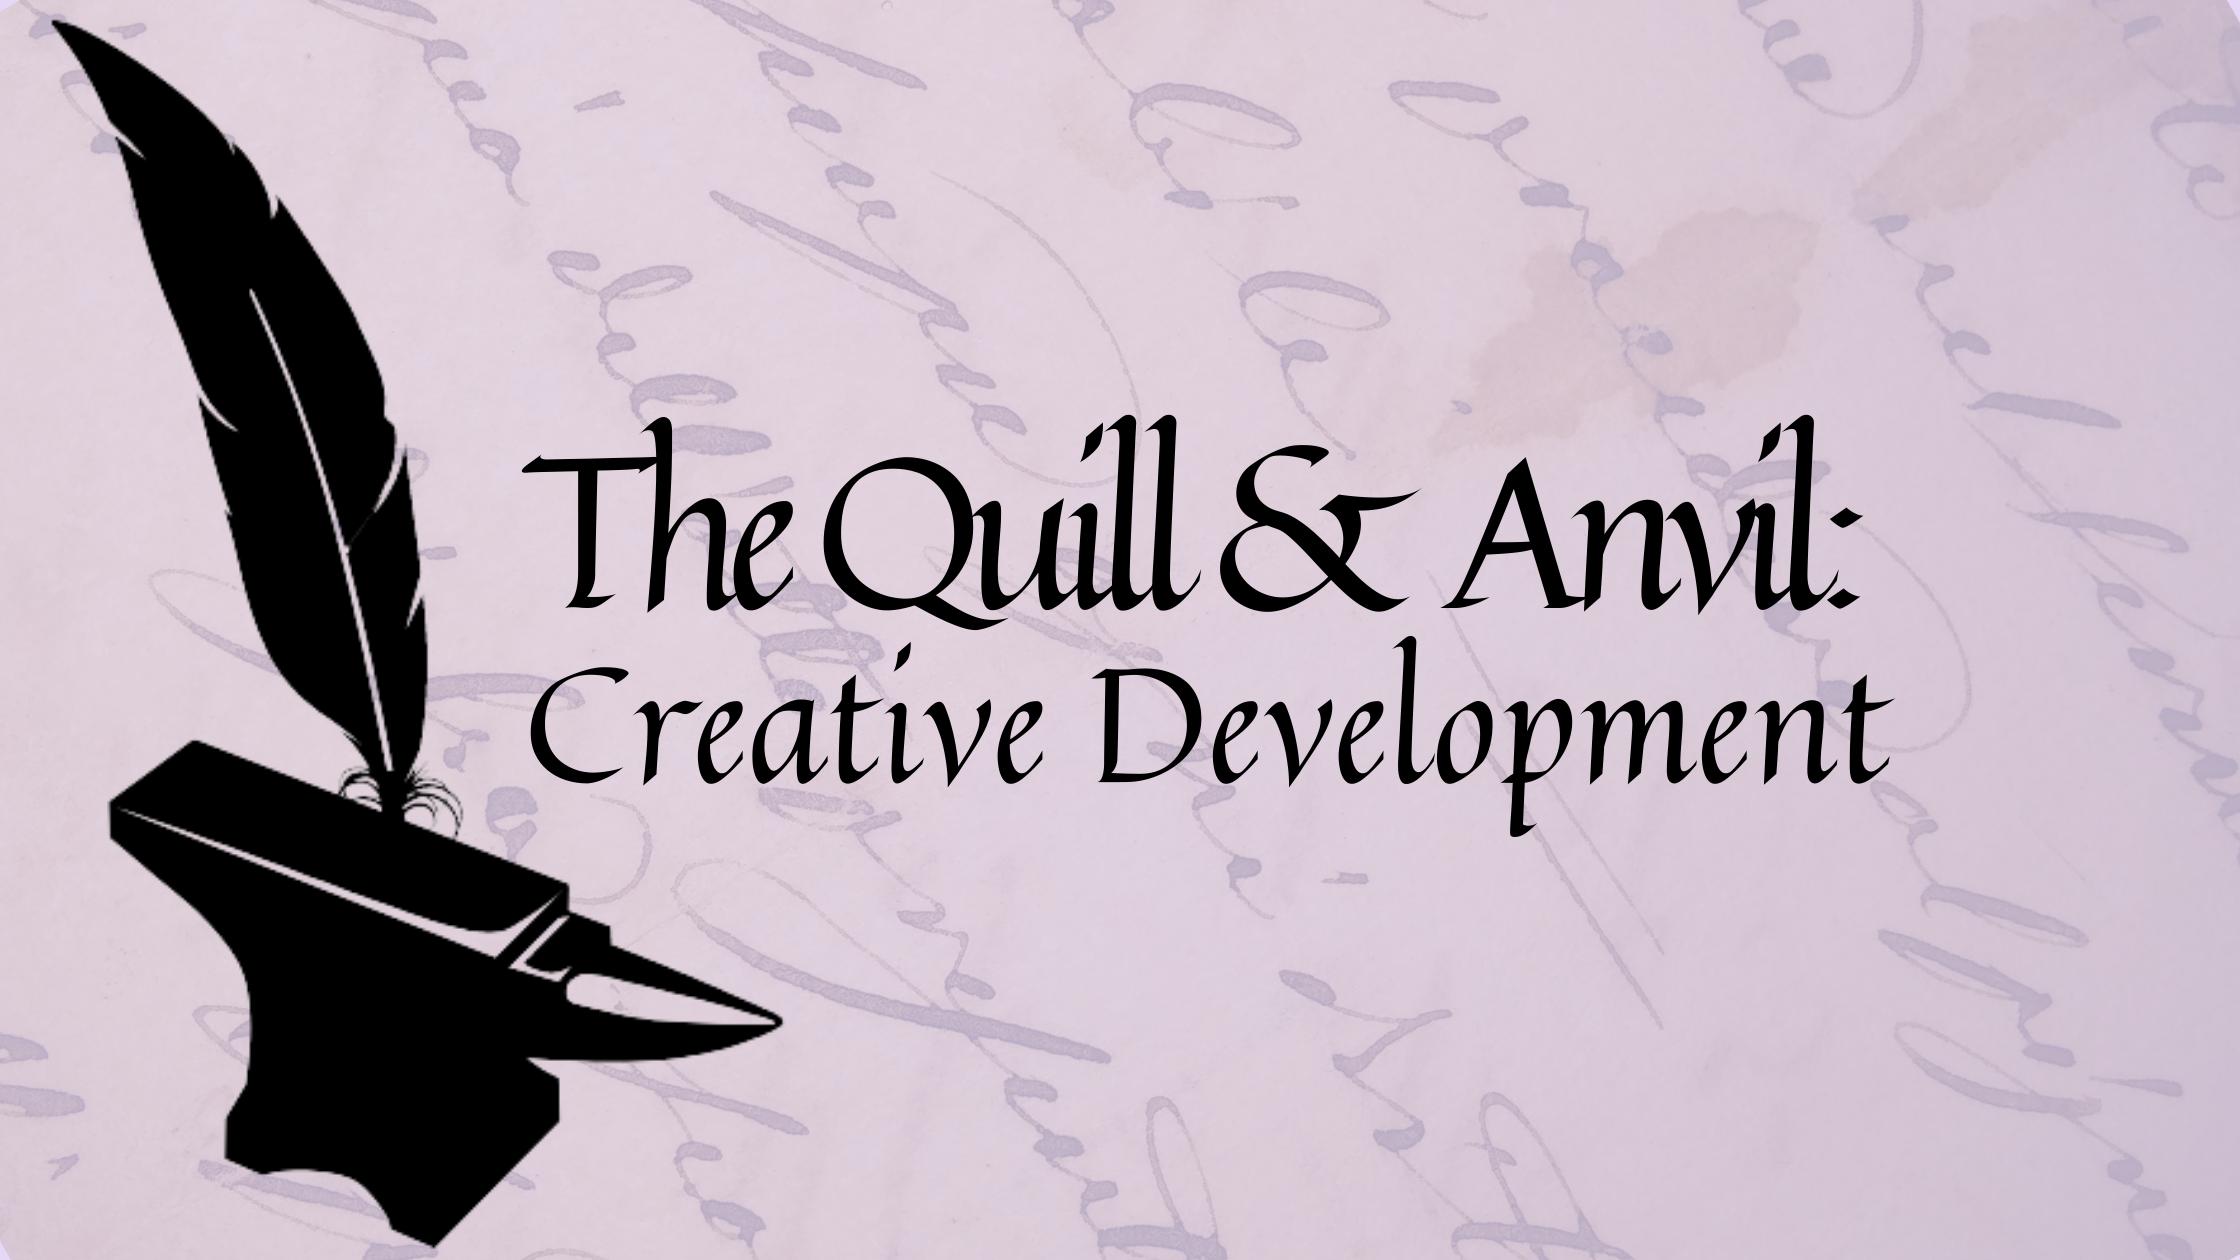 The Quill & Anvil - Creative Development